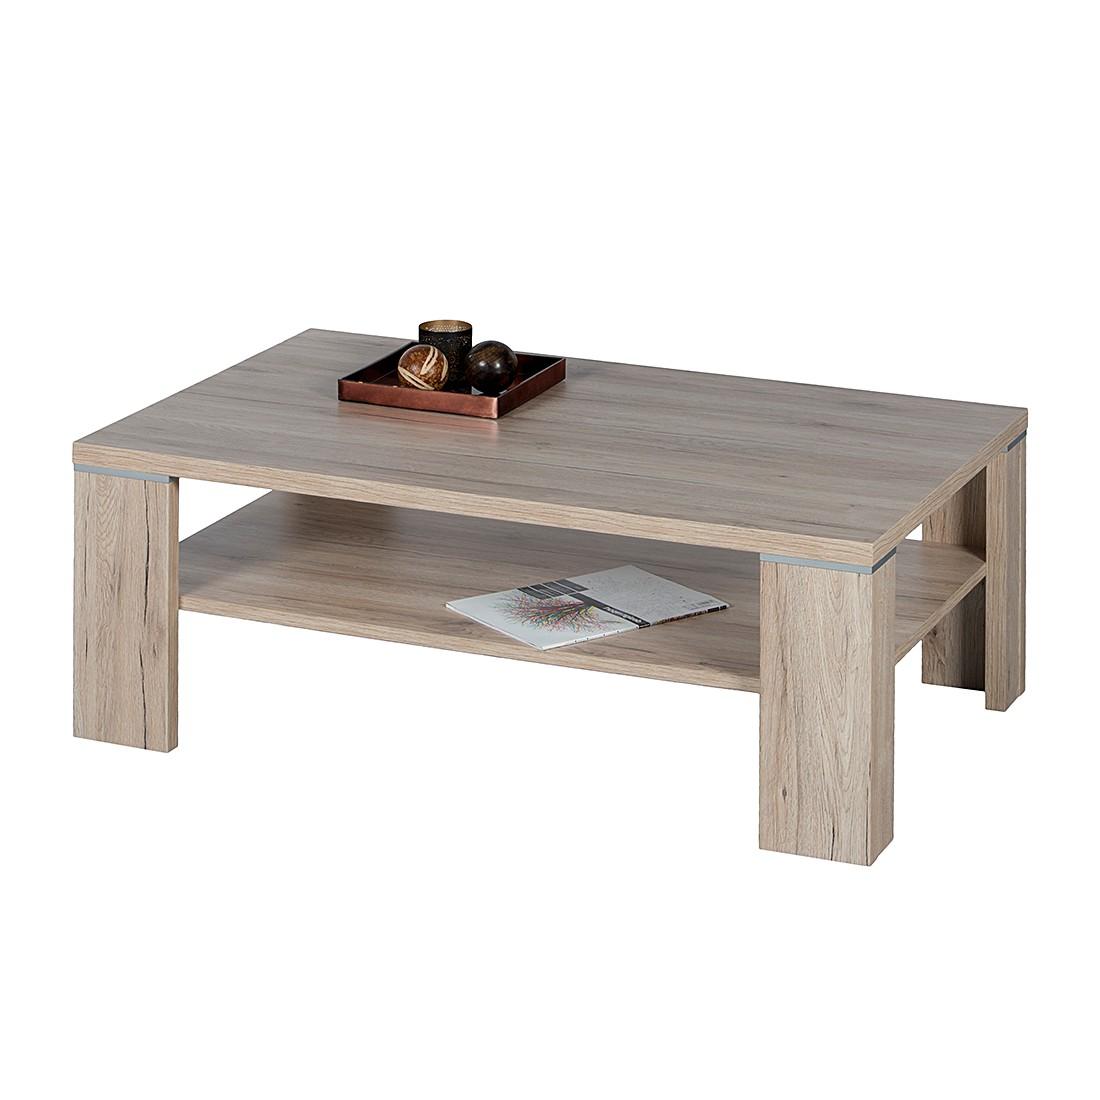 Table basse Okazaki - Imitation chêne de San Remo, mooved